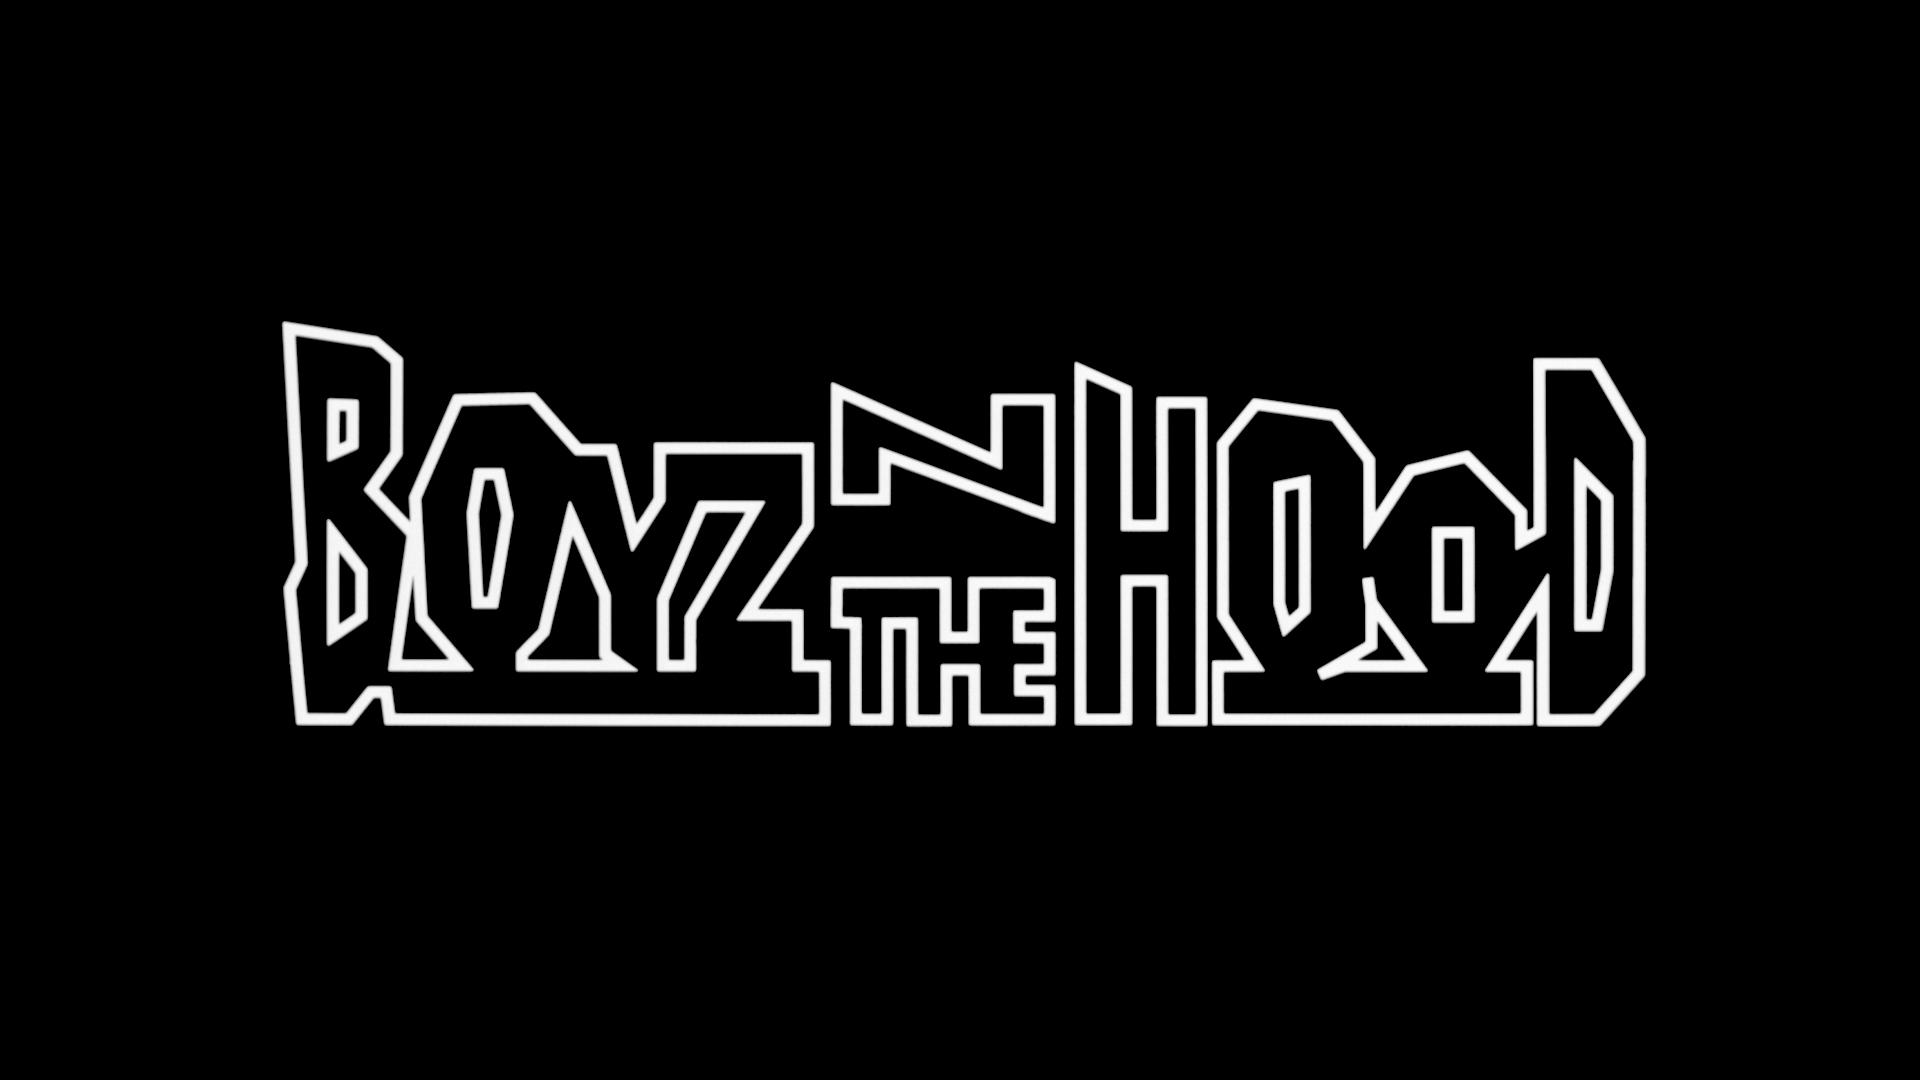 highdefdiscnewscomBoyz N the Hood   Blu ray Disc Review 1920x1080